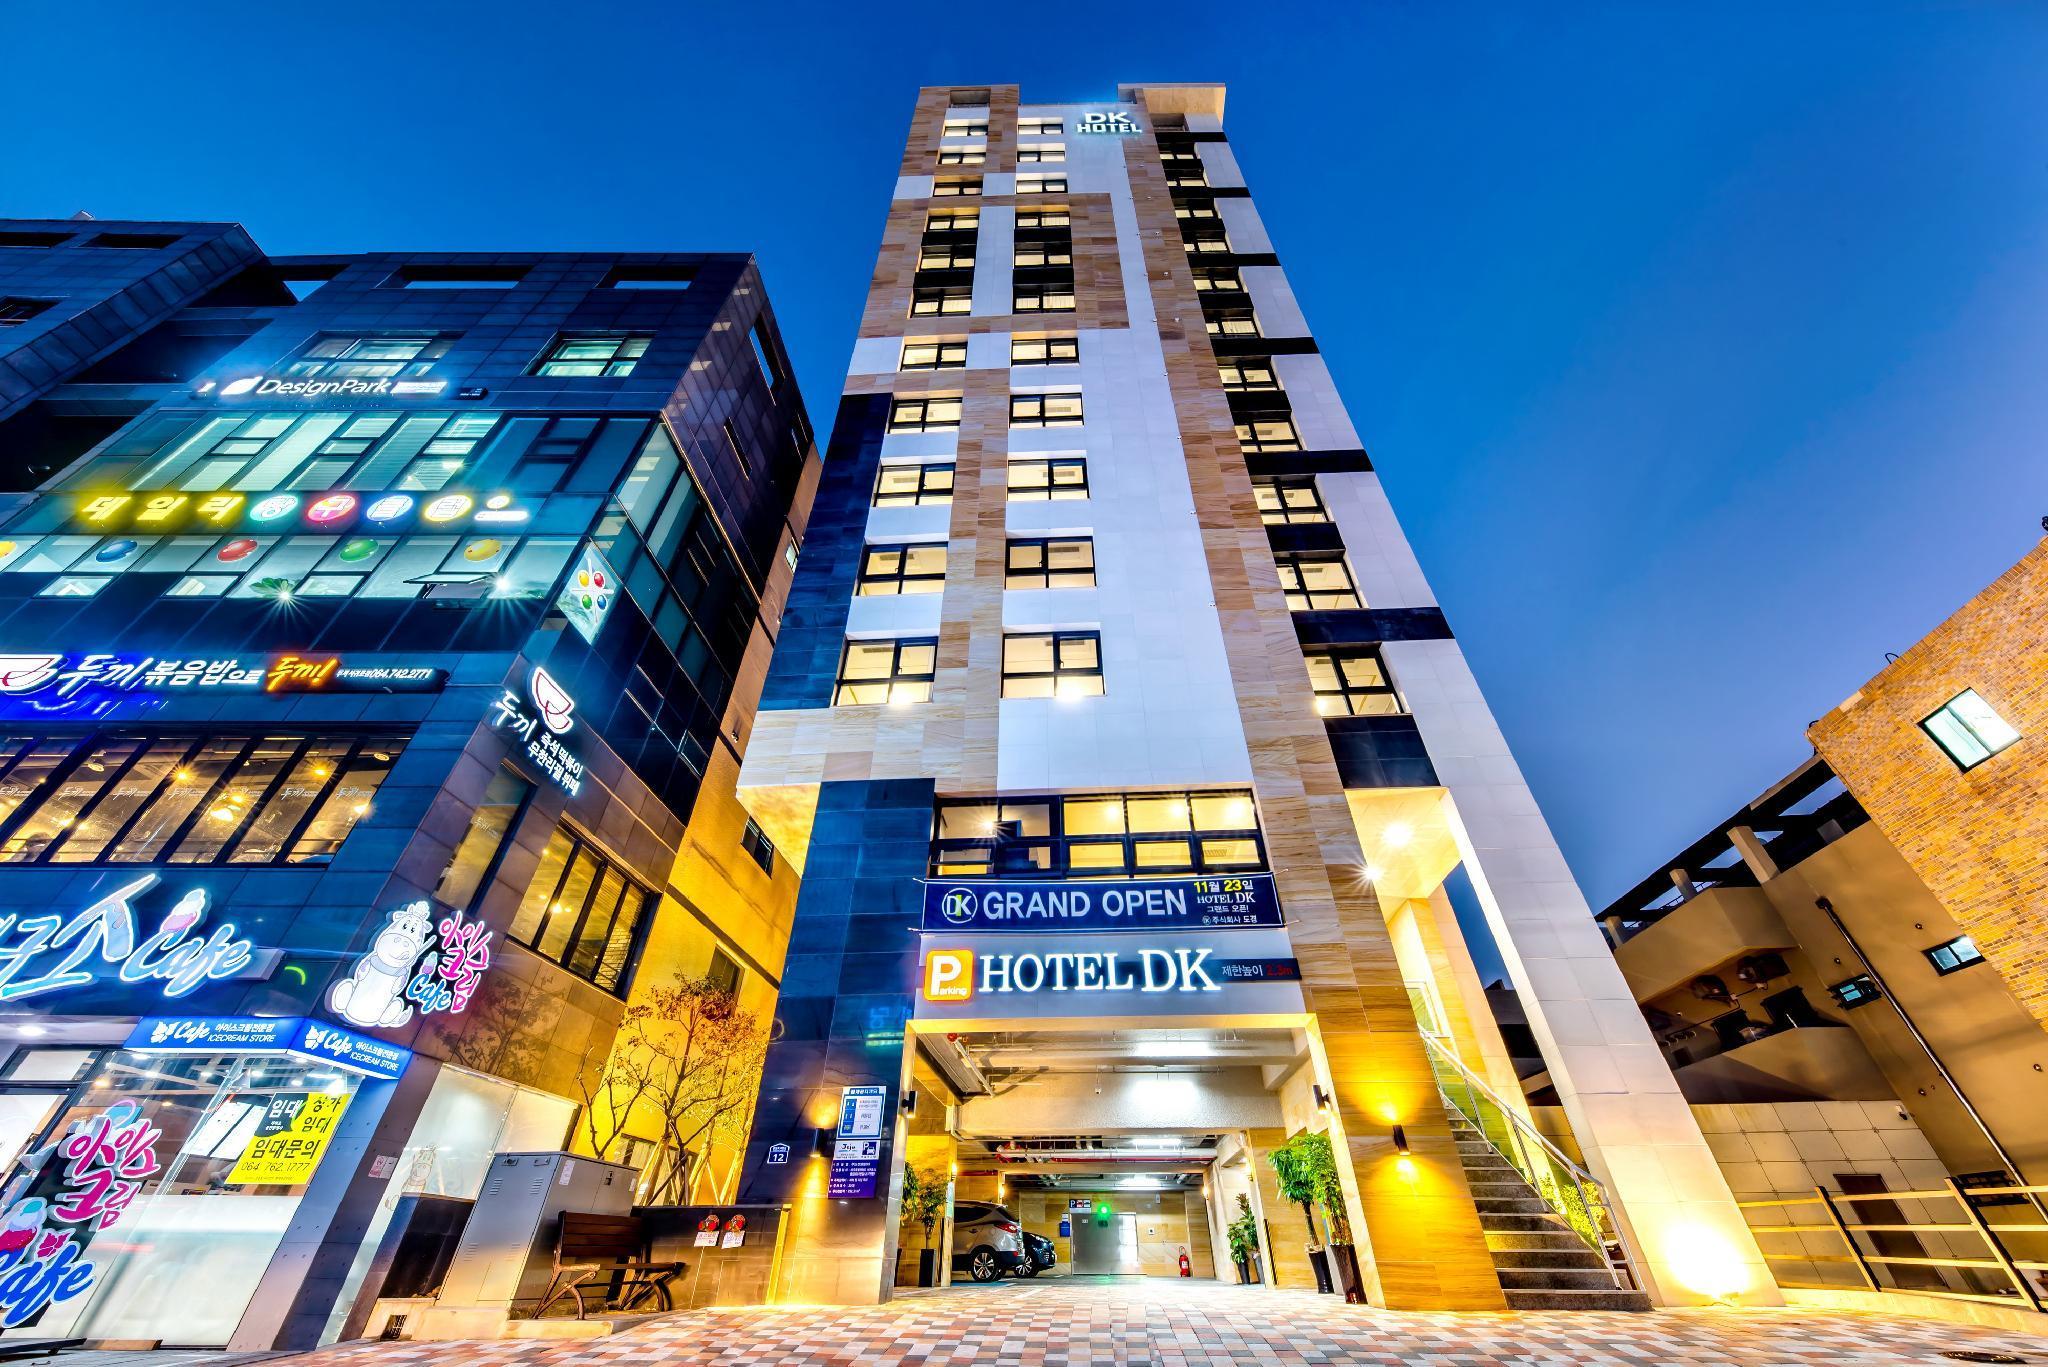 Hotel DK